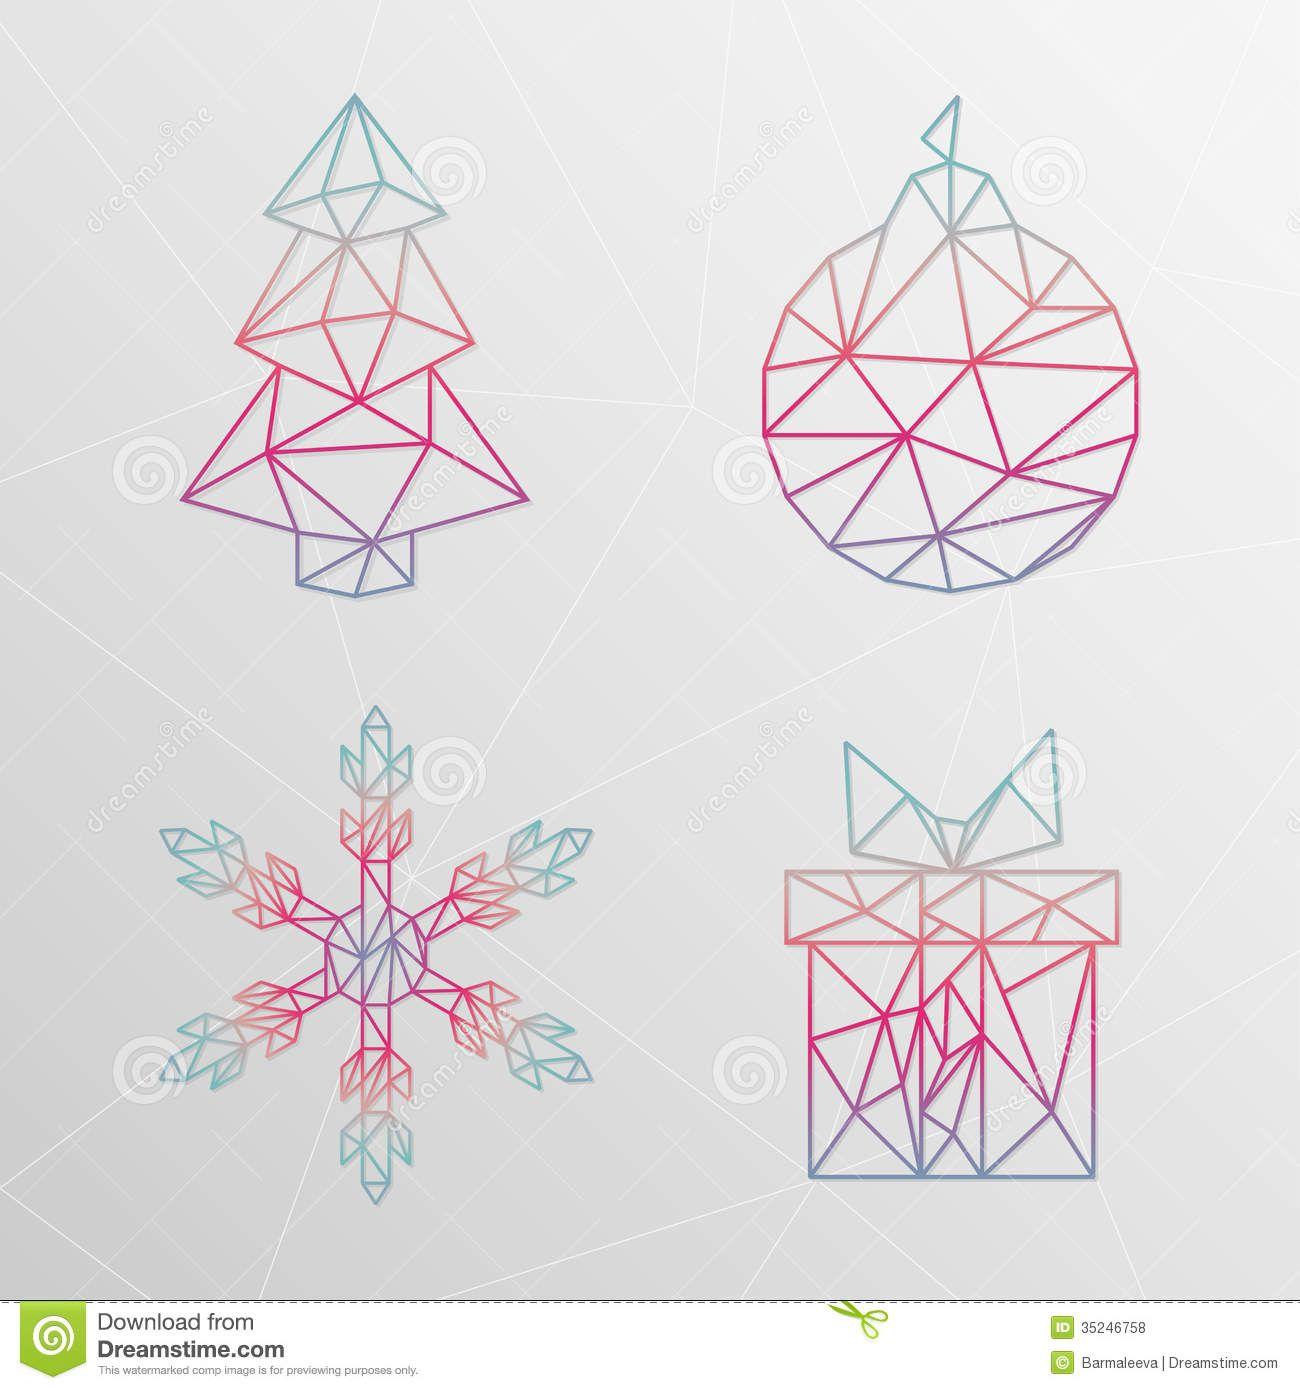 Abstract Geometric Christmas Designs